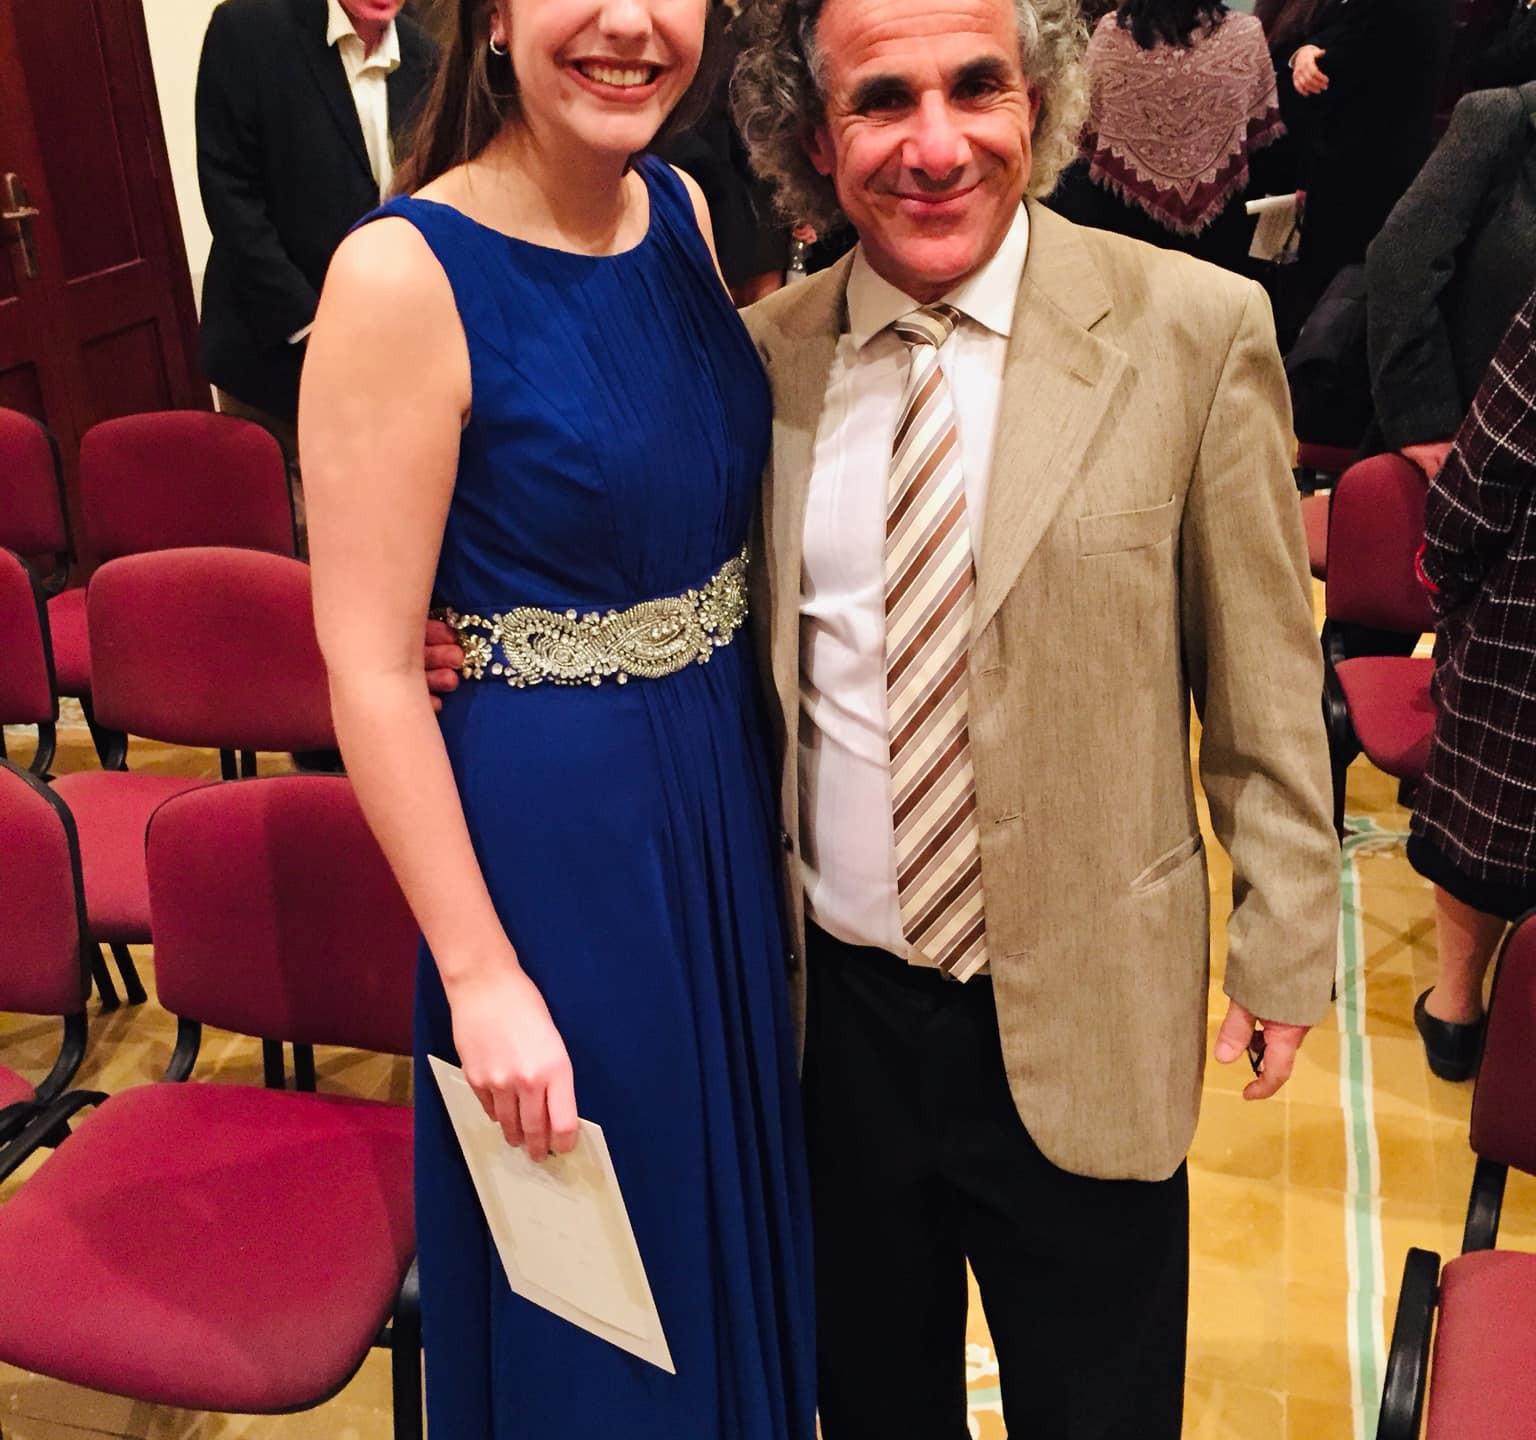 With Colin Attard, director of Gaulitana: A Festival of Music.